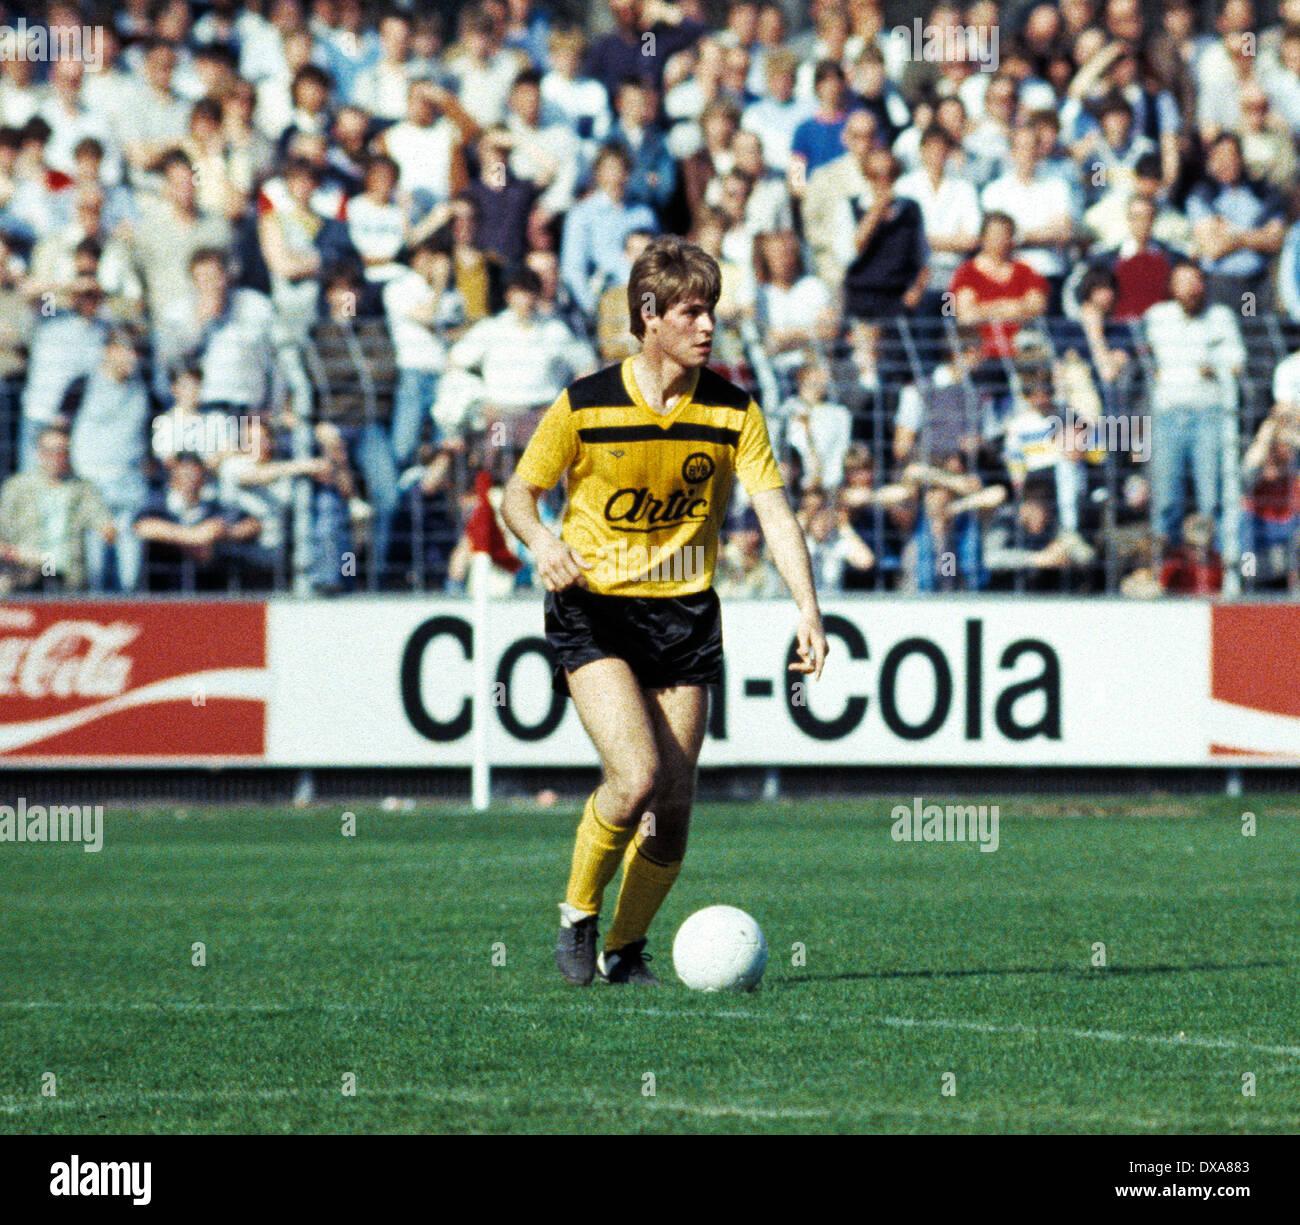 football, Bundesliga, 1983/1984, Grotenburg Stadium, FC Bayer 05 Uerdingen versus Borussia Dortmund 2:1, scene of the match, Ralf Loose (BVB) in ball possession - Stock Image